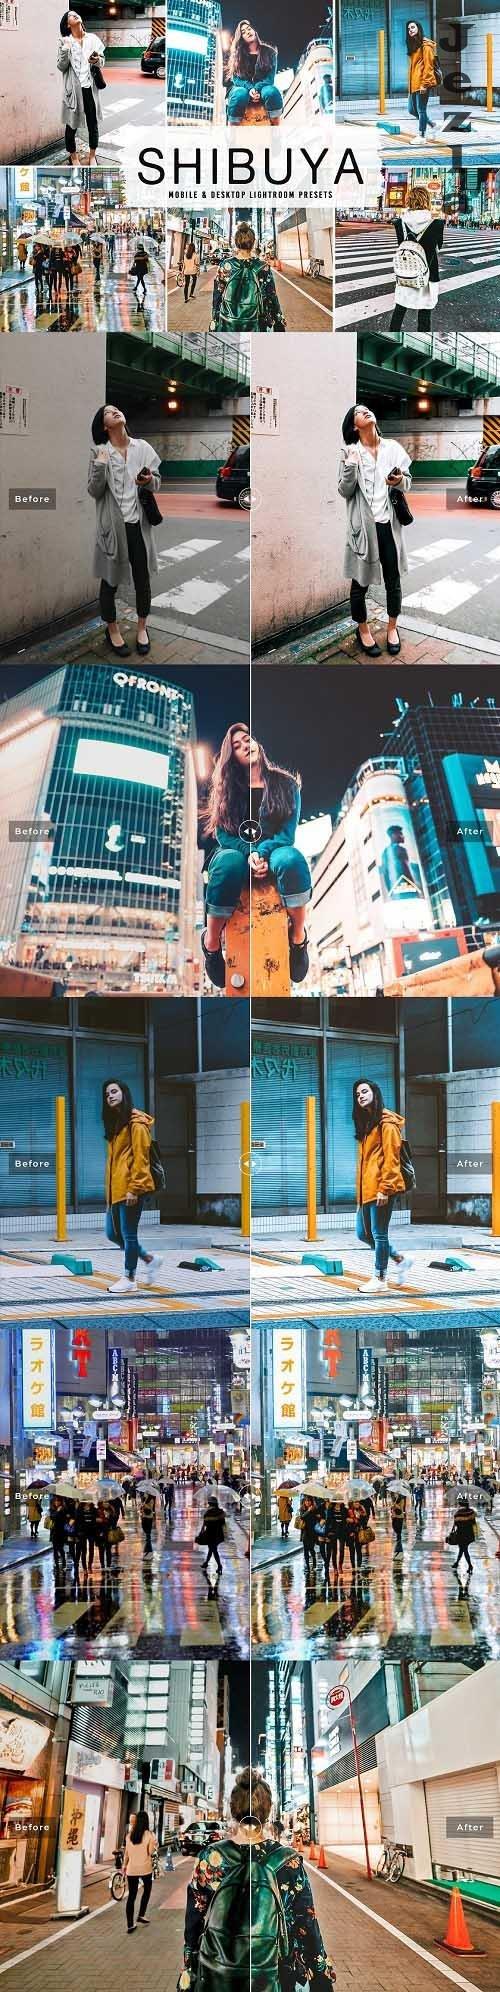 Shibuya Pro LRM Presets - 6525722